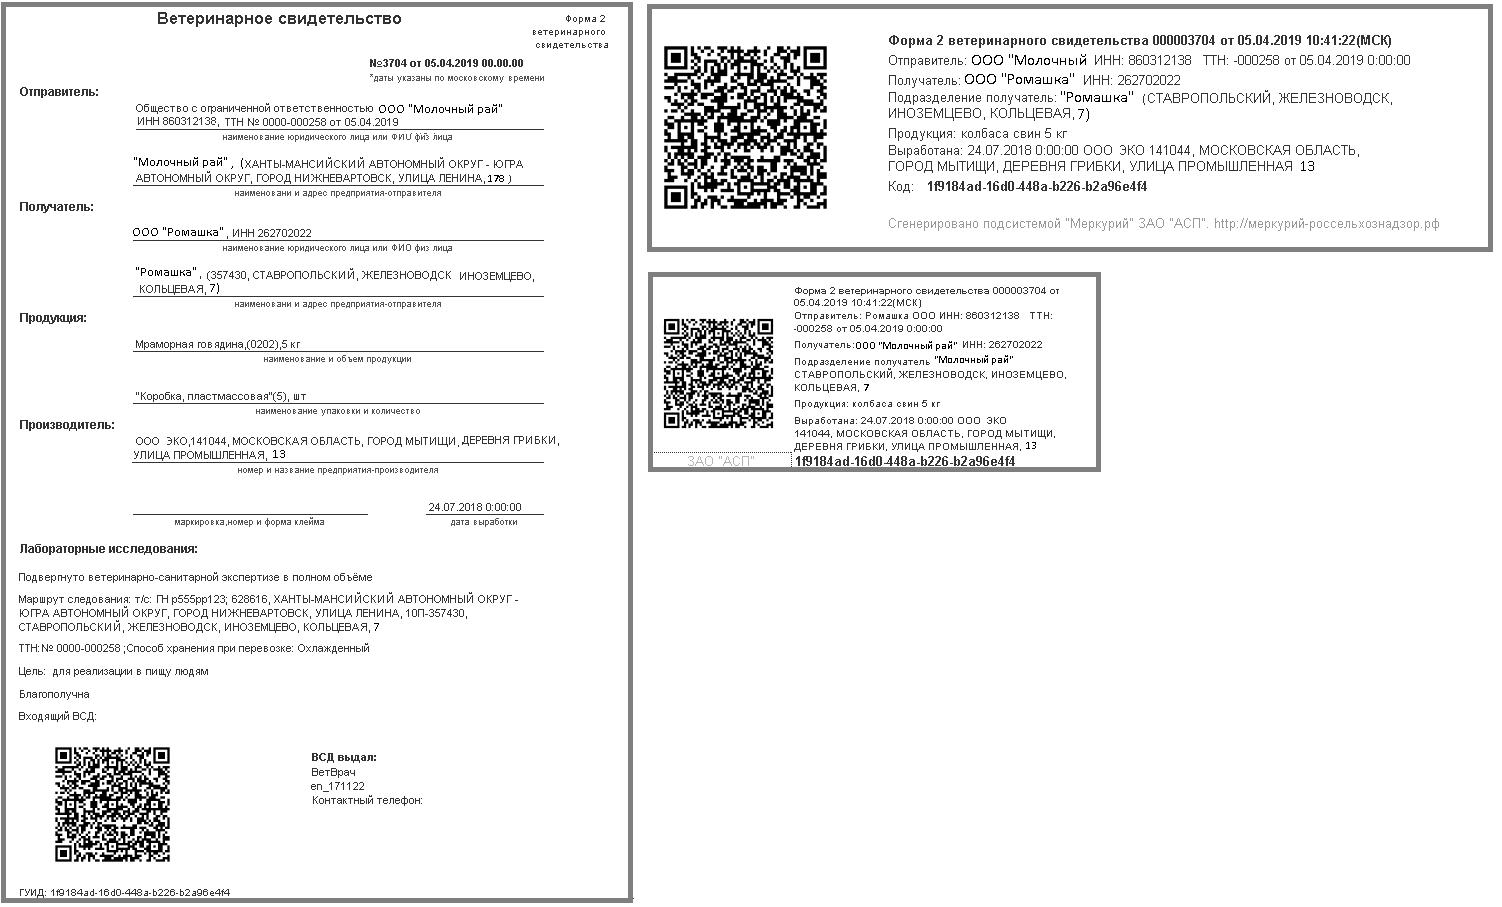 7. Пример форм печати сертификатов